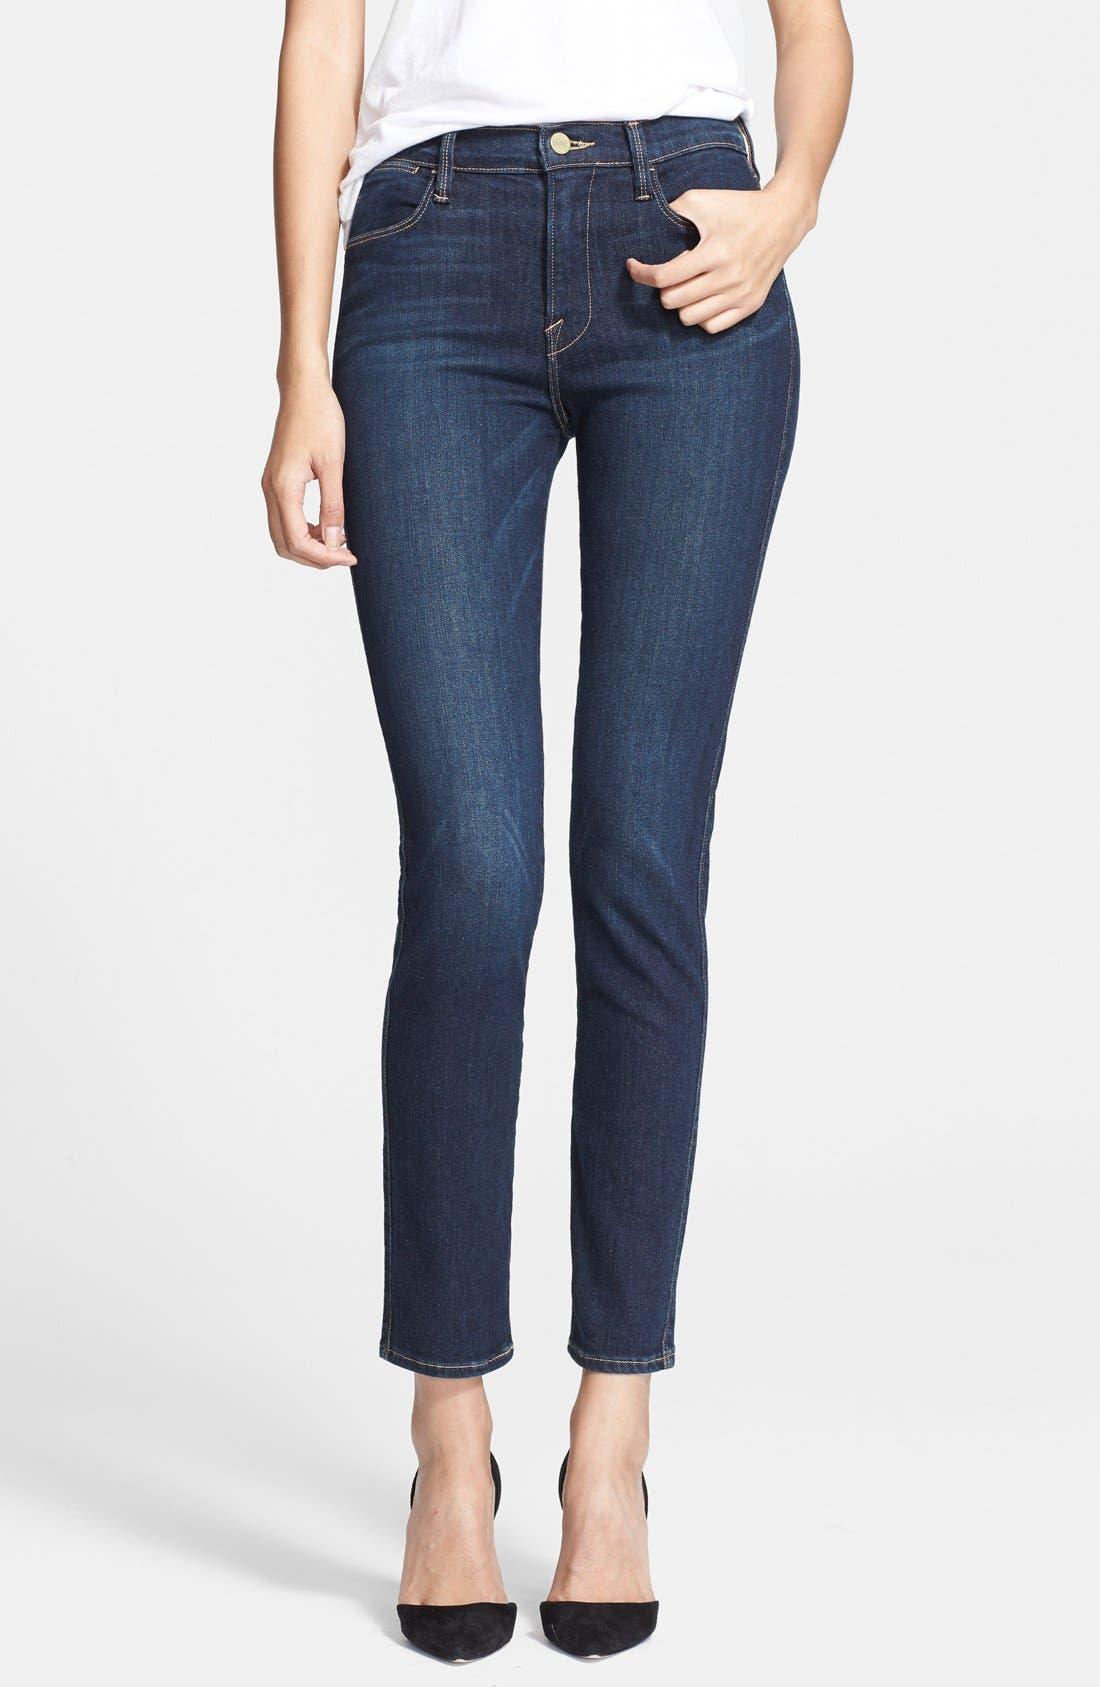 Alternate Image 1 Selected - Frame Denim 'Le High Skinny' Jeans (Altair)